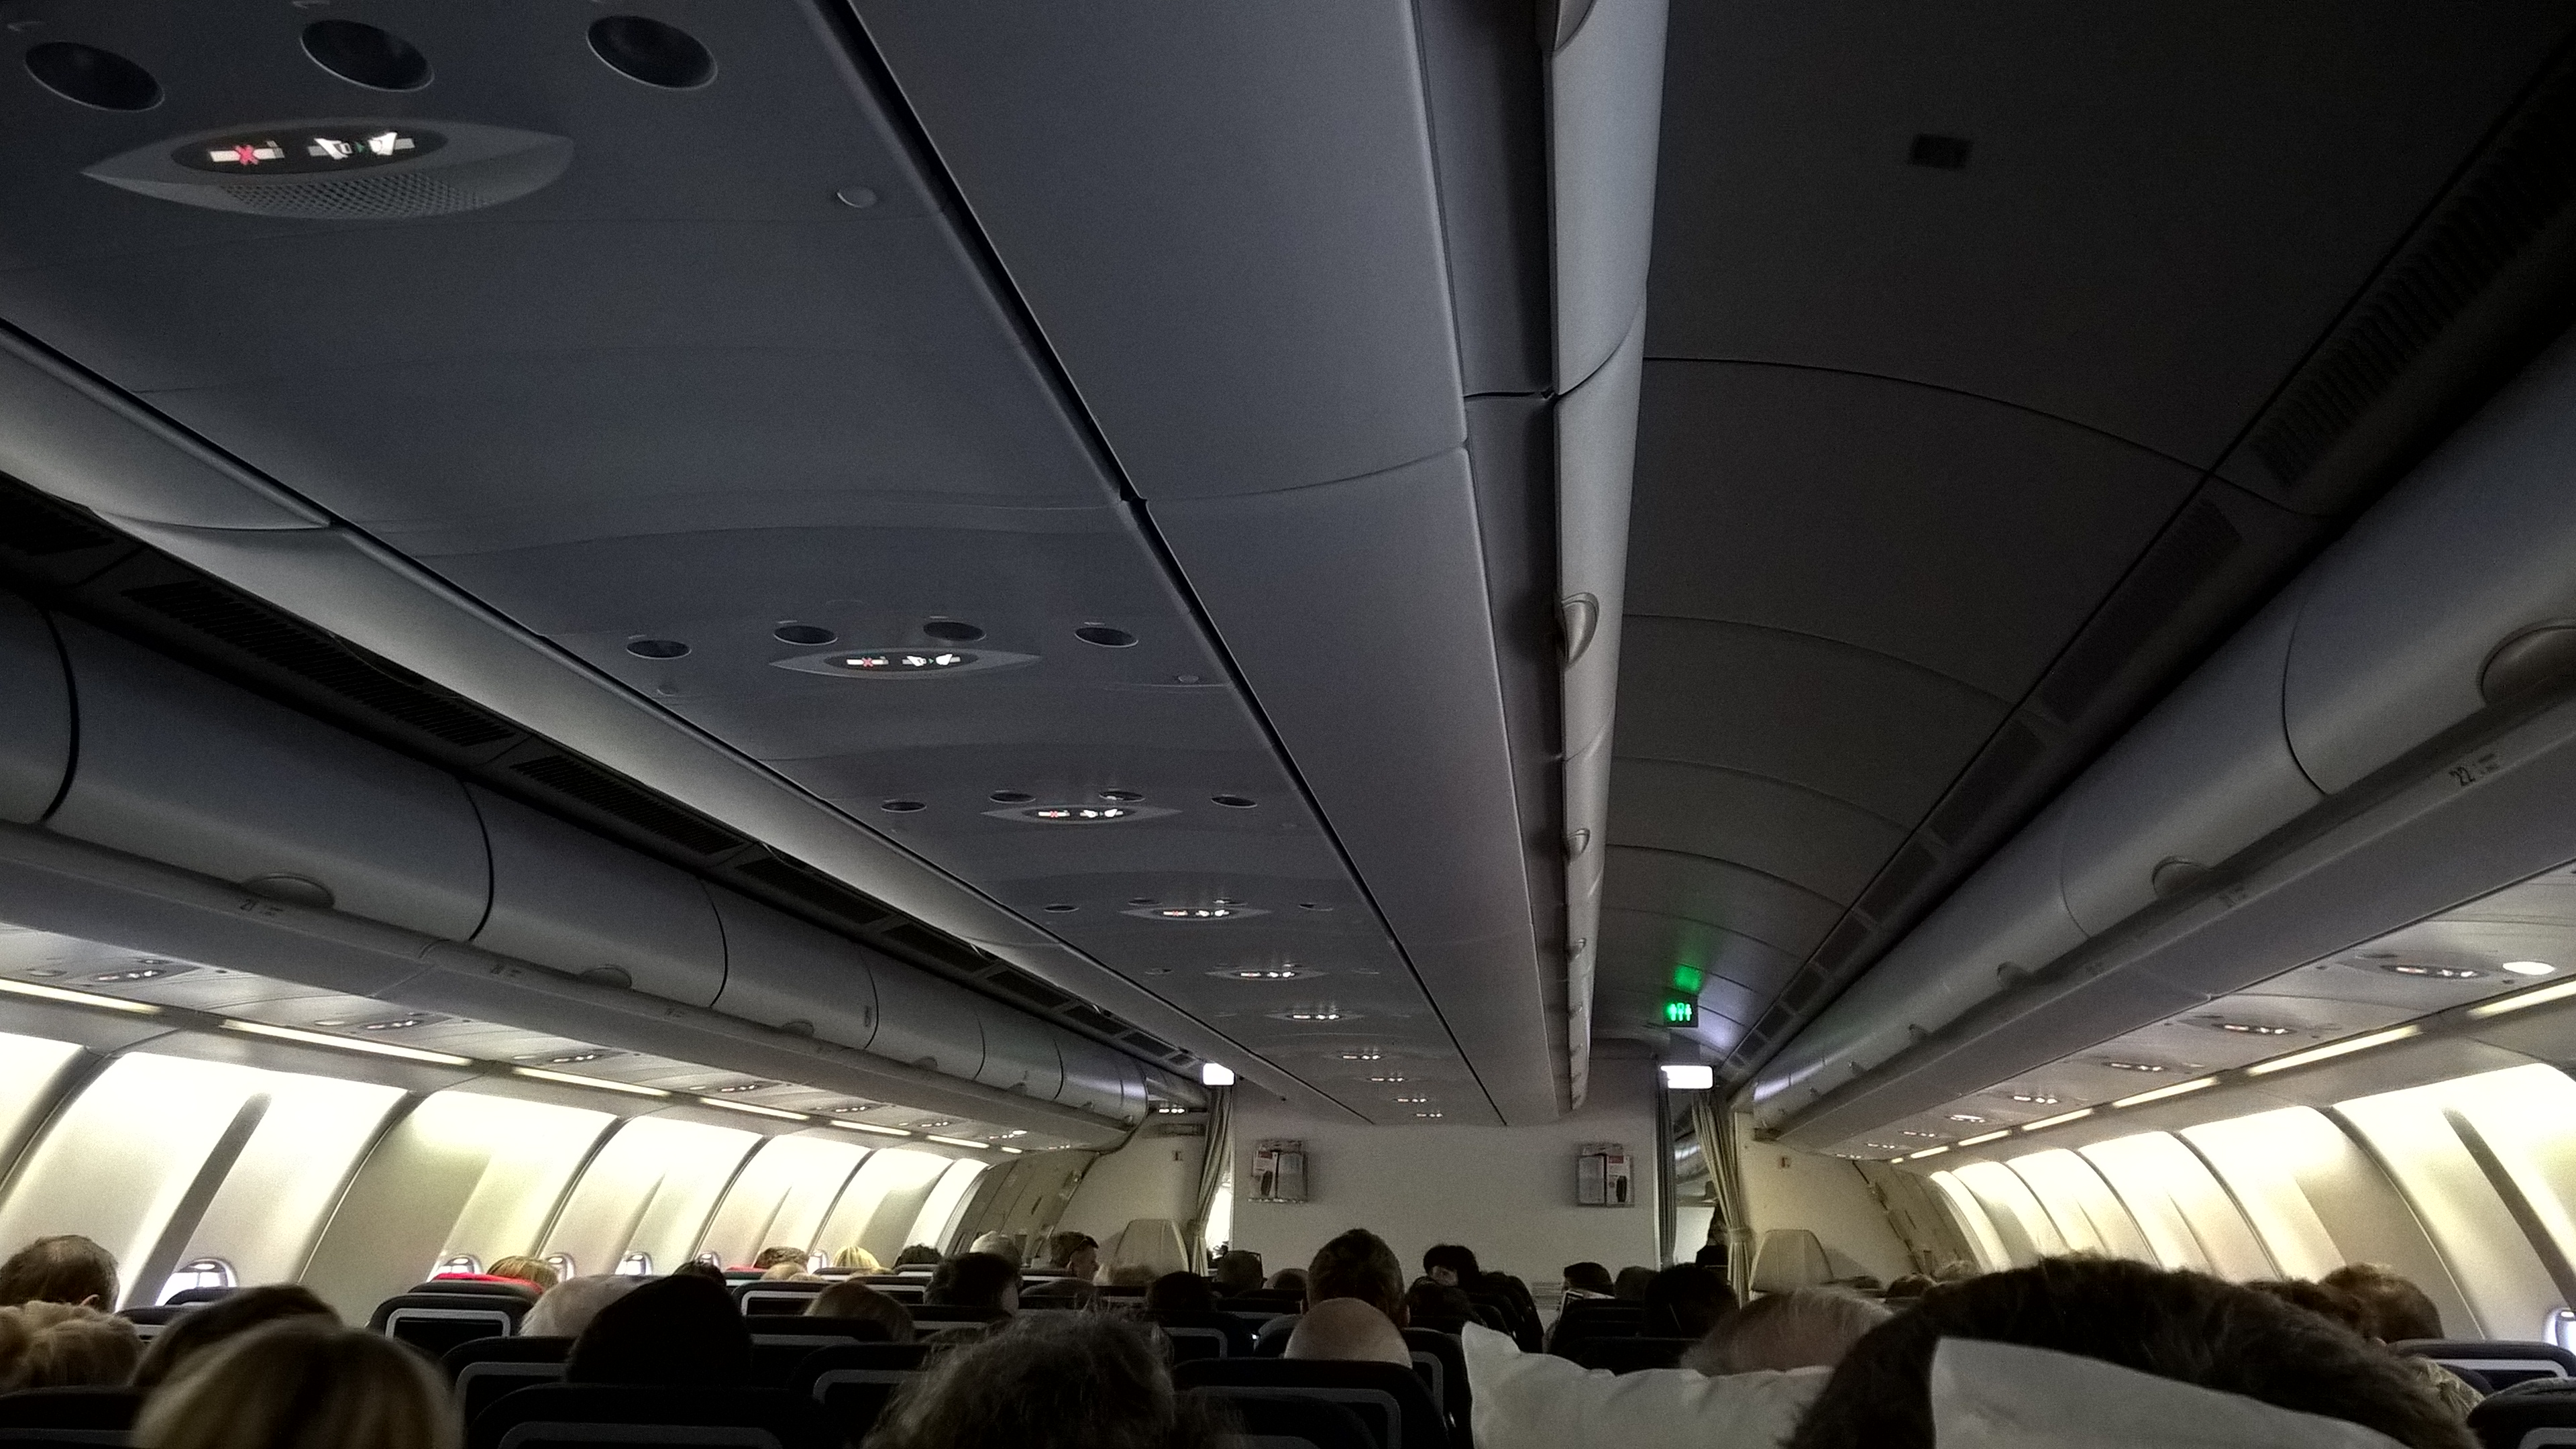 Aufnahme: Blick ins Flugzeug